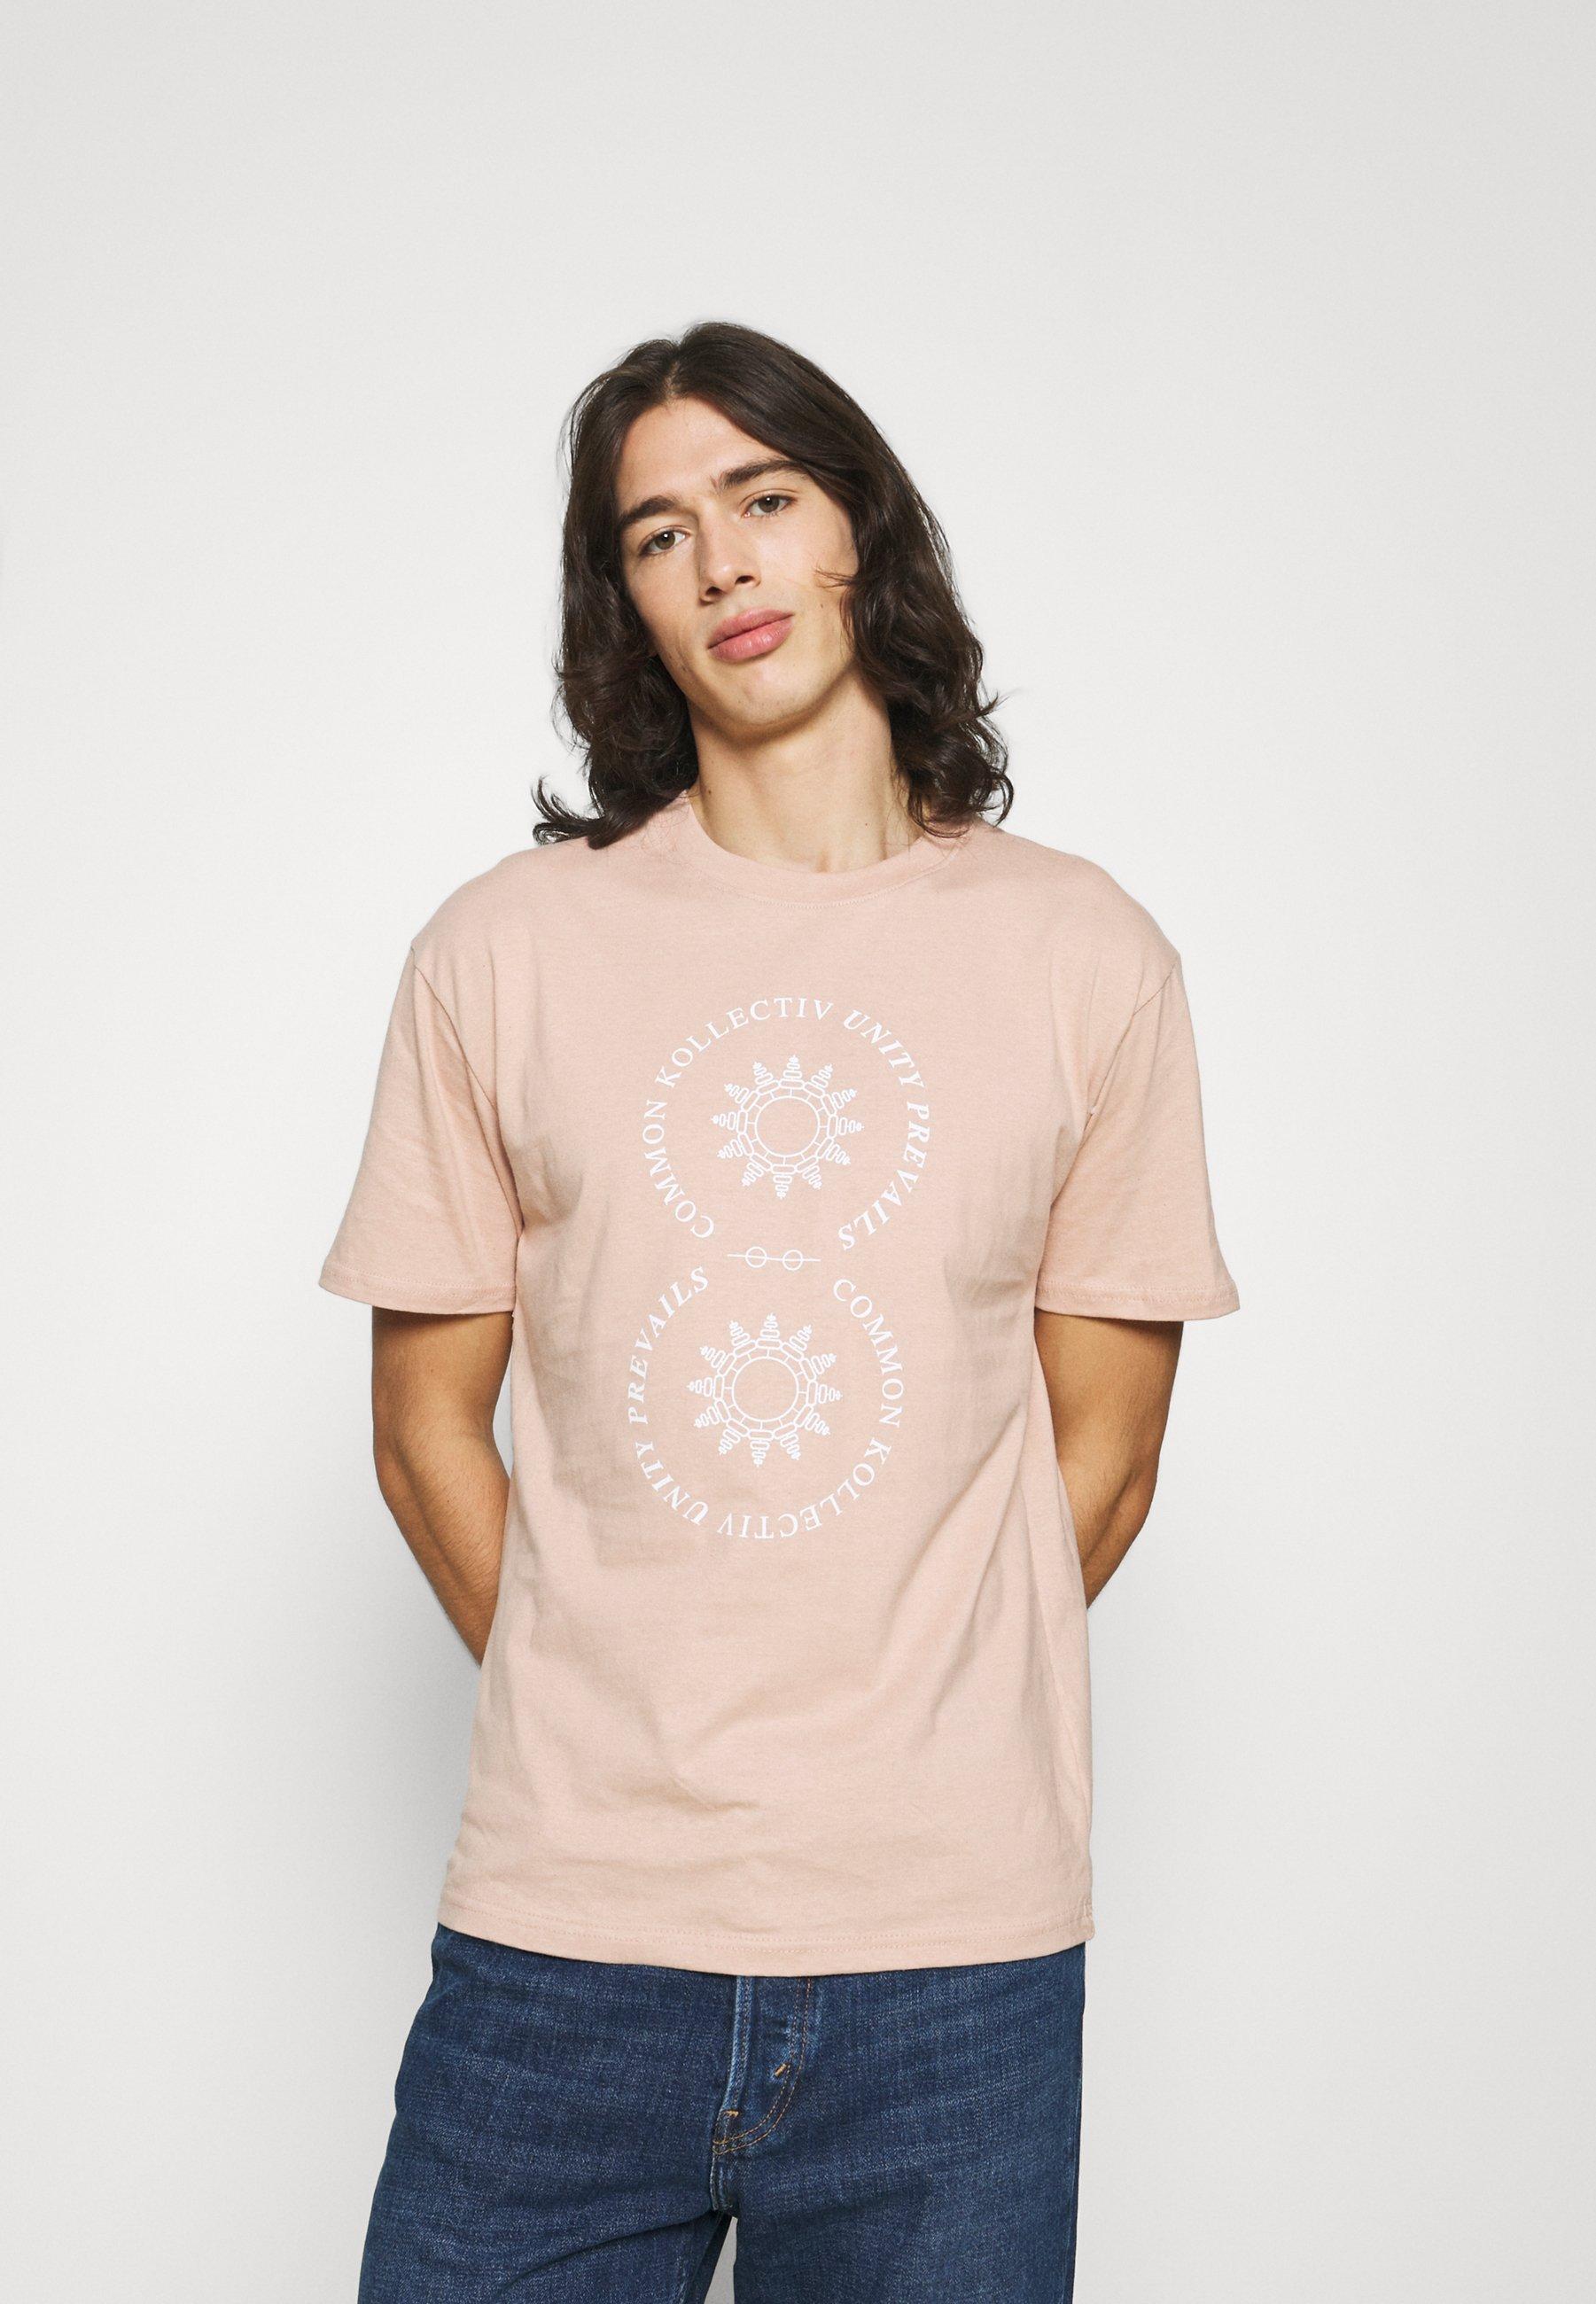 Uomo VISION UNISEX - T-shirt con stampa